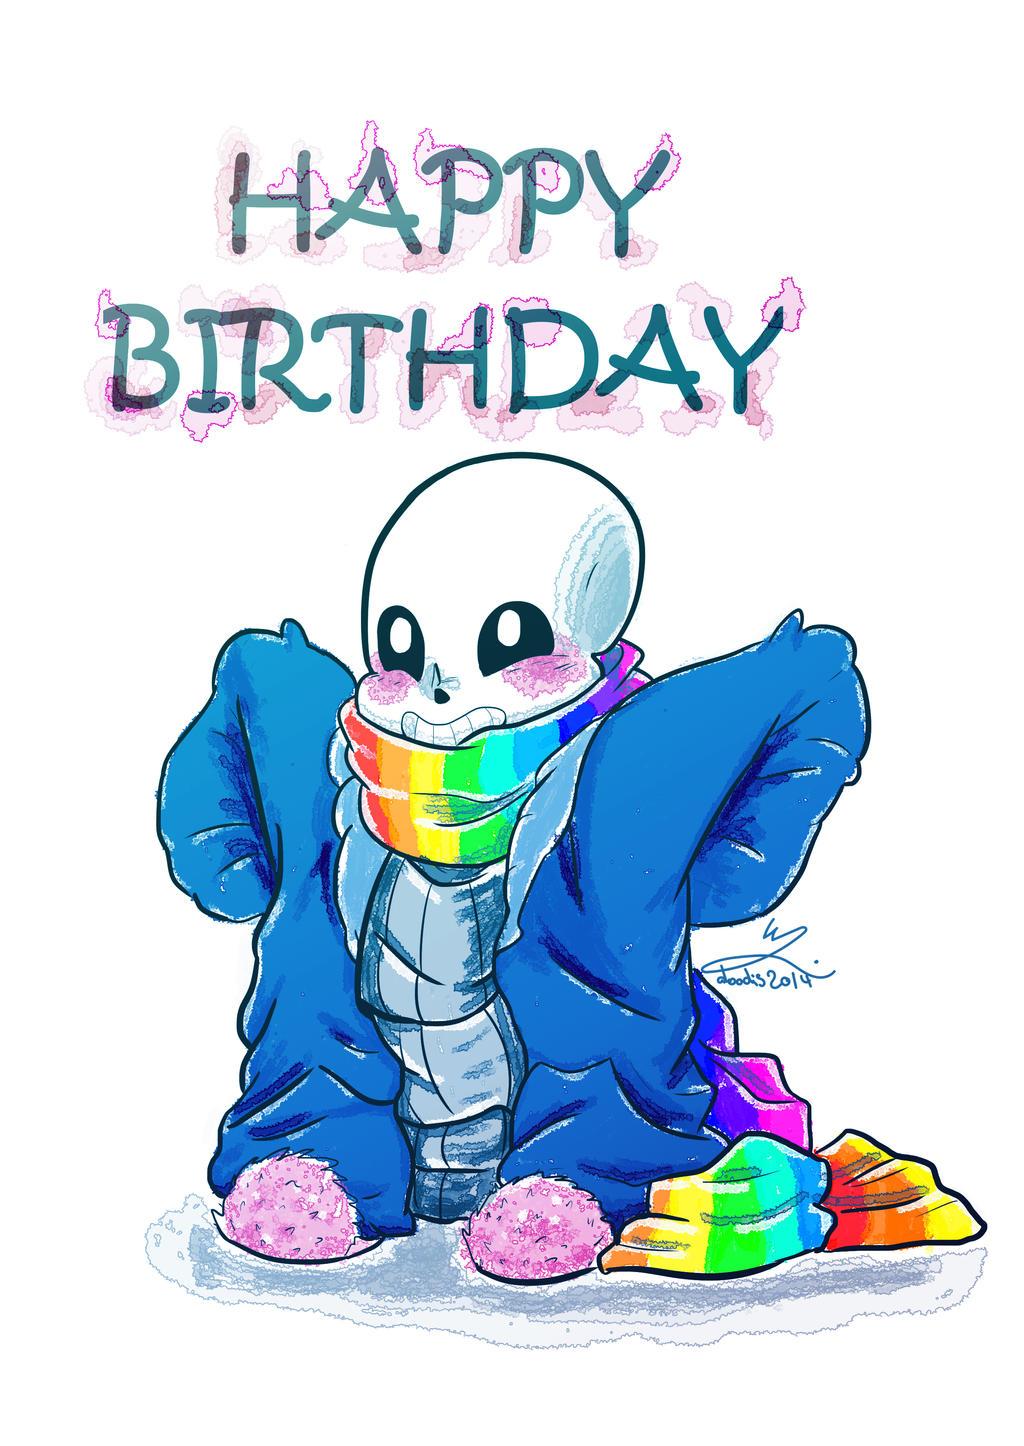 Happy Birthday R! Sans by doodis2014 on DeviantArt